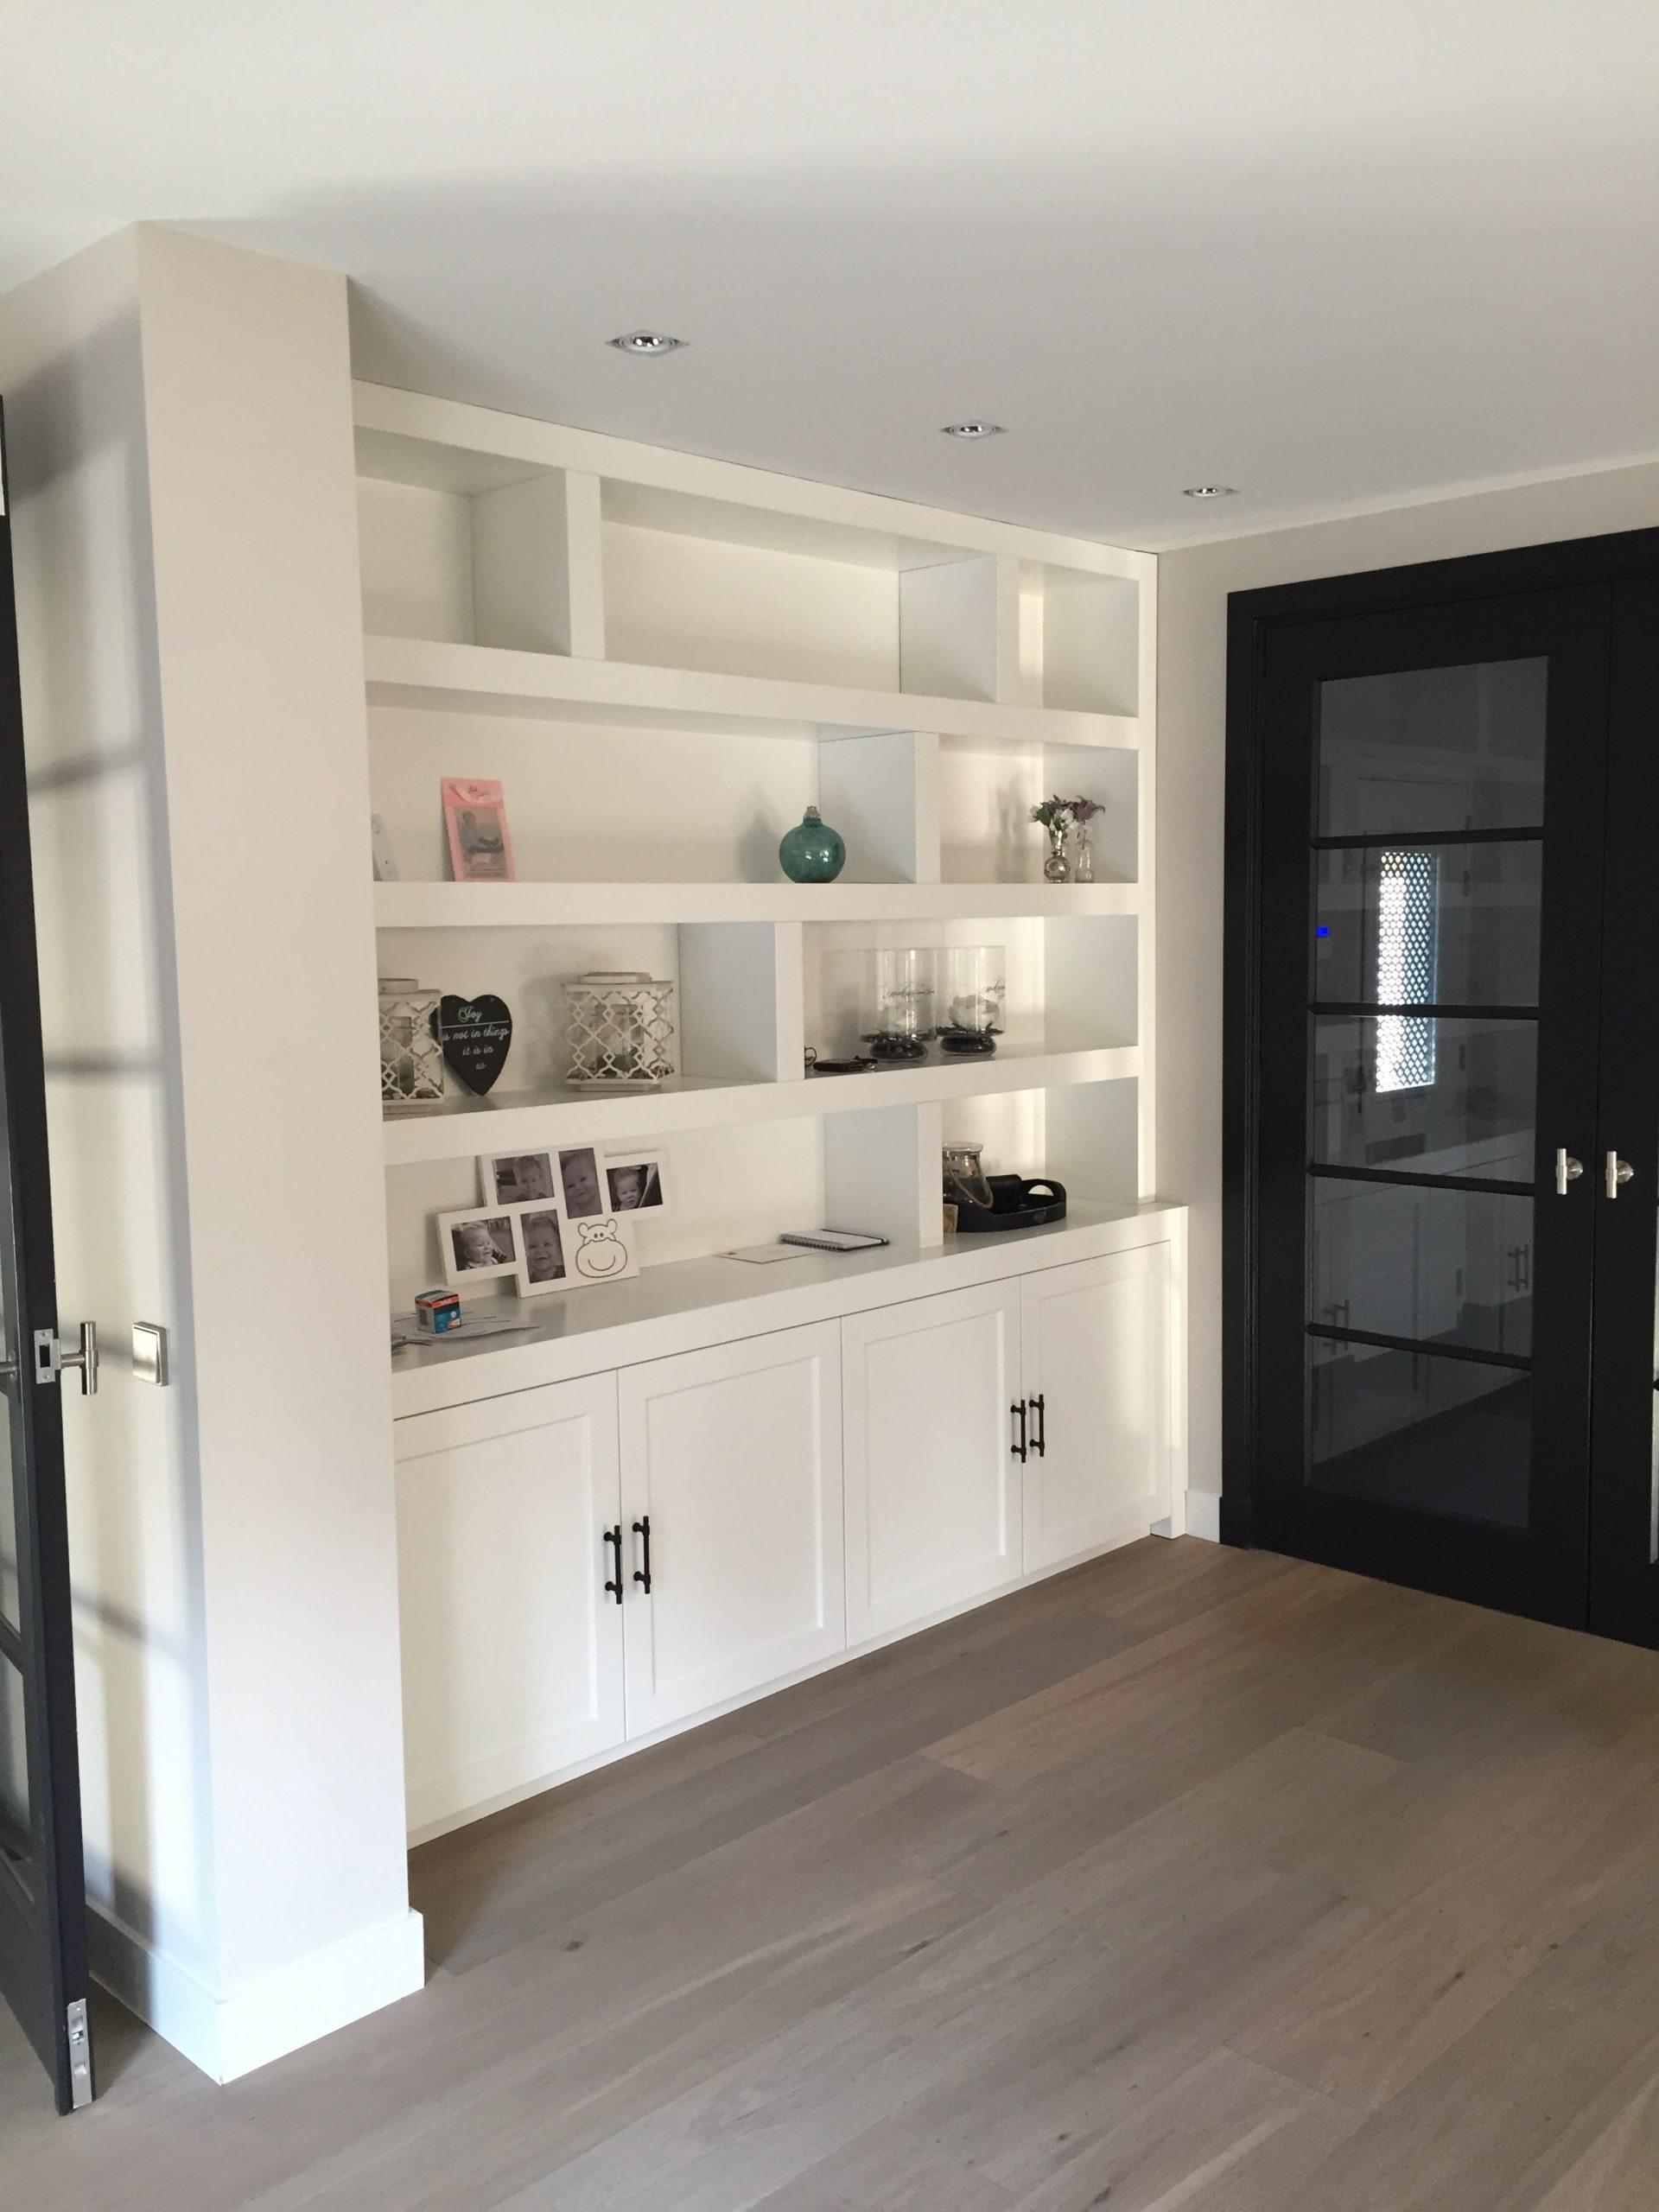 Dapri Interieurbouw - Woning Inrichting Heemstede (2)